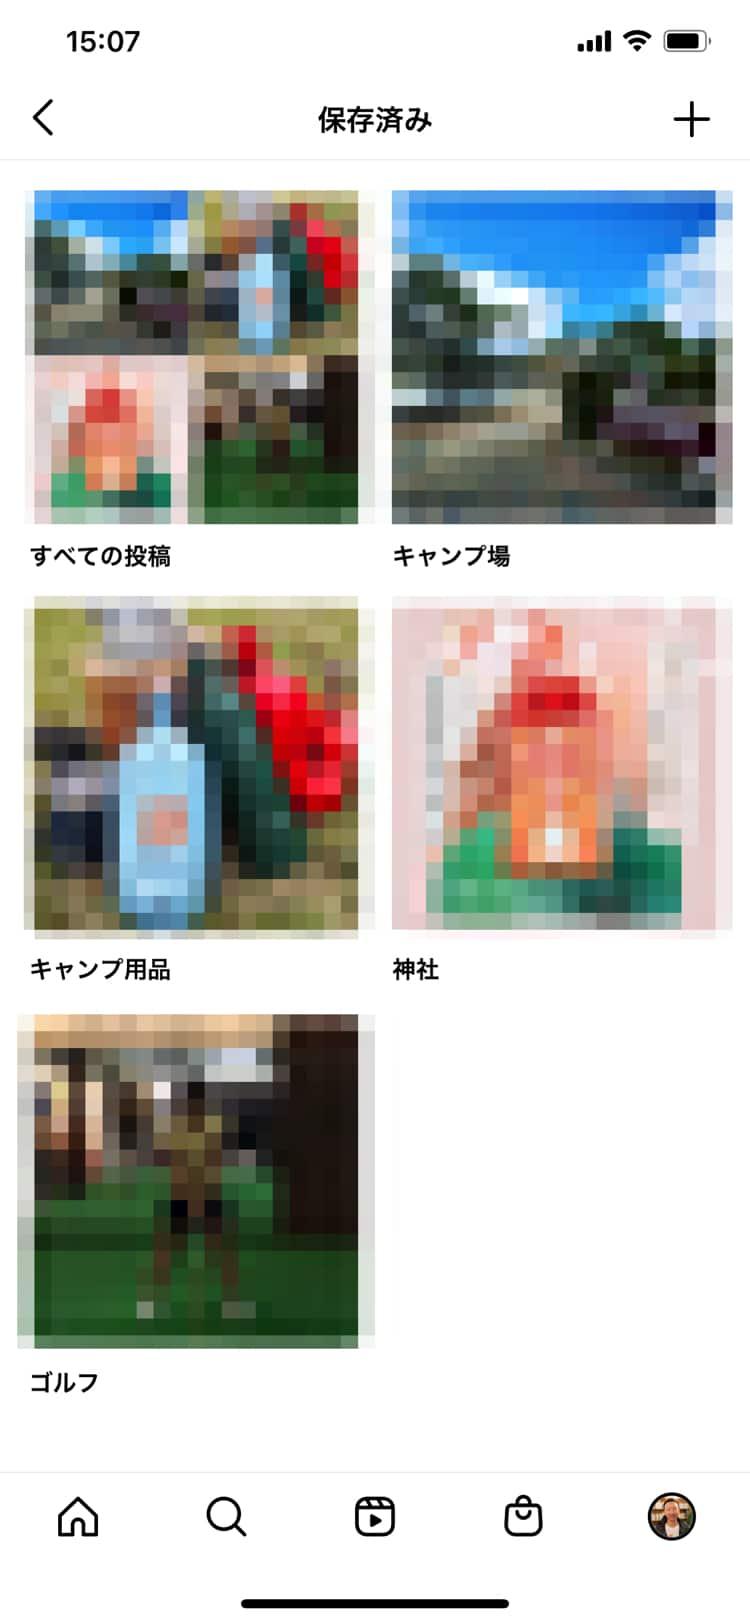 Instagramで作成したコレクションの一覧表示